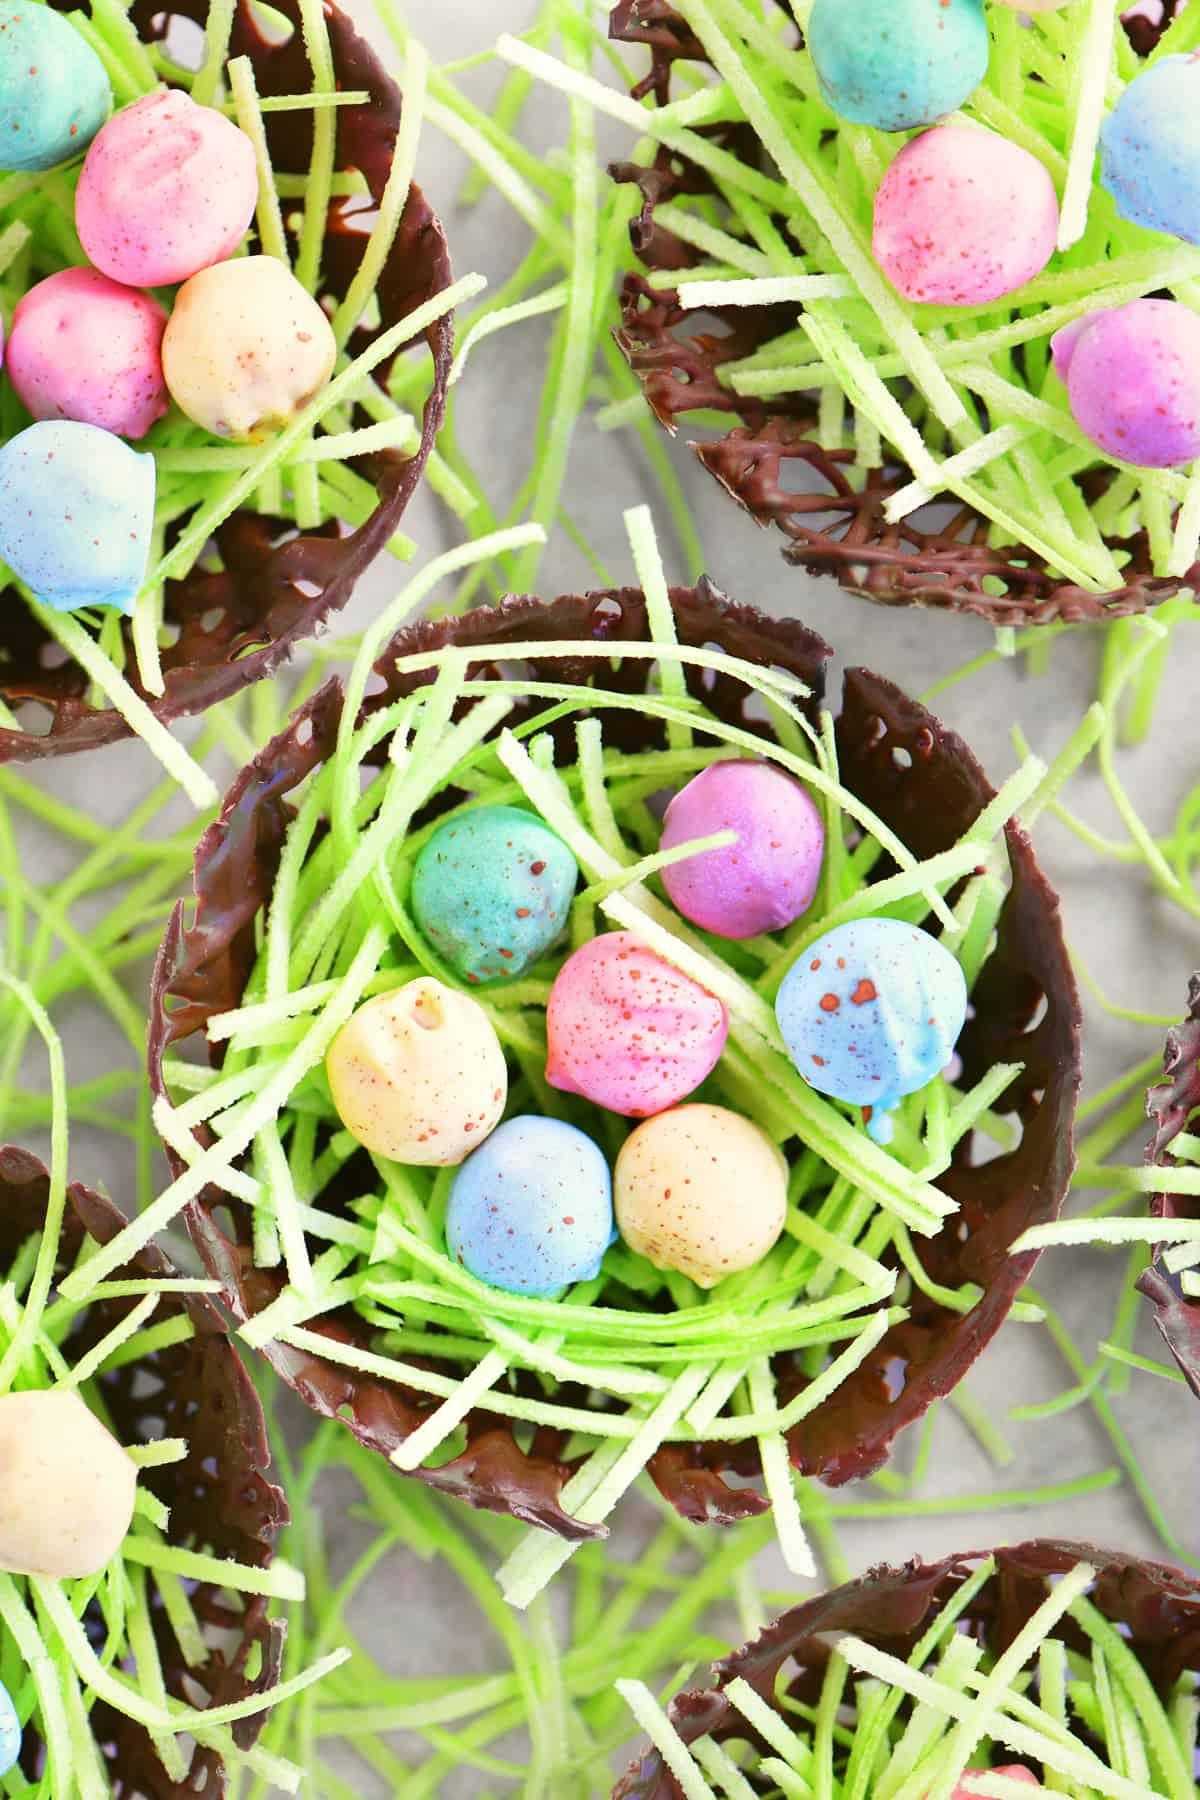 bright, cheery pretzel nugget eggs in a chocolate nest